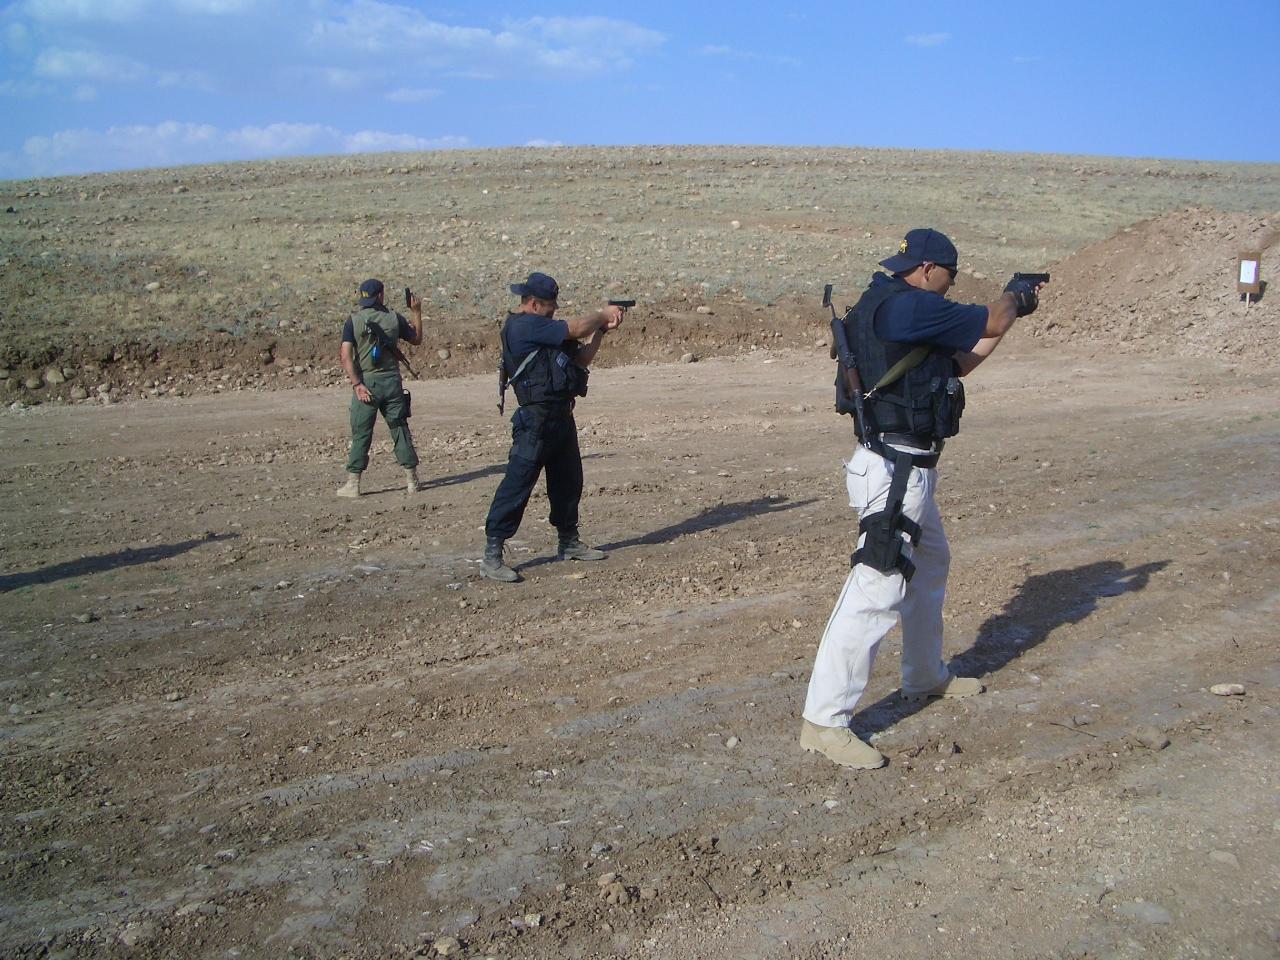 On rifle range